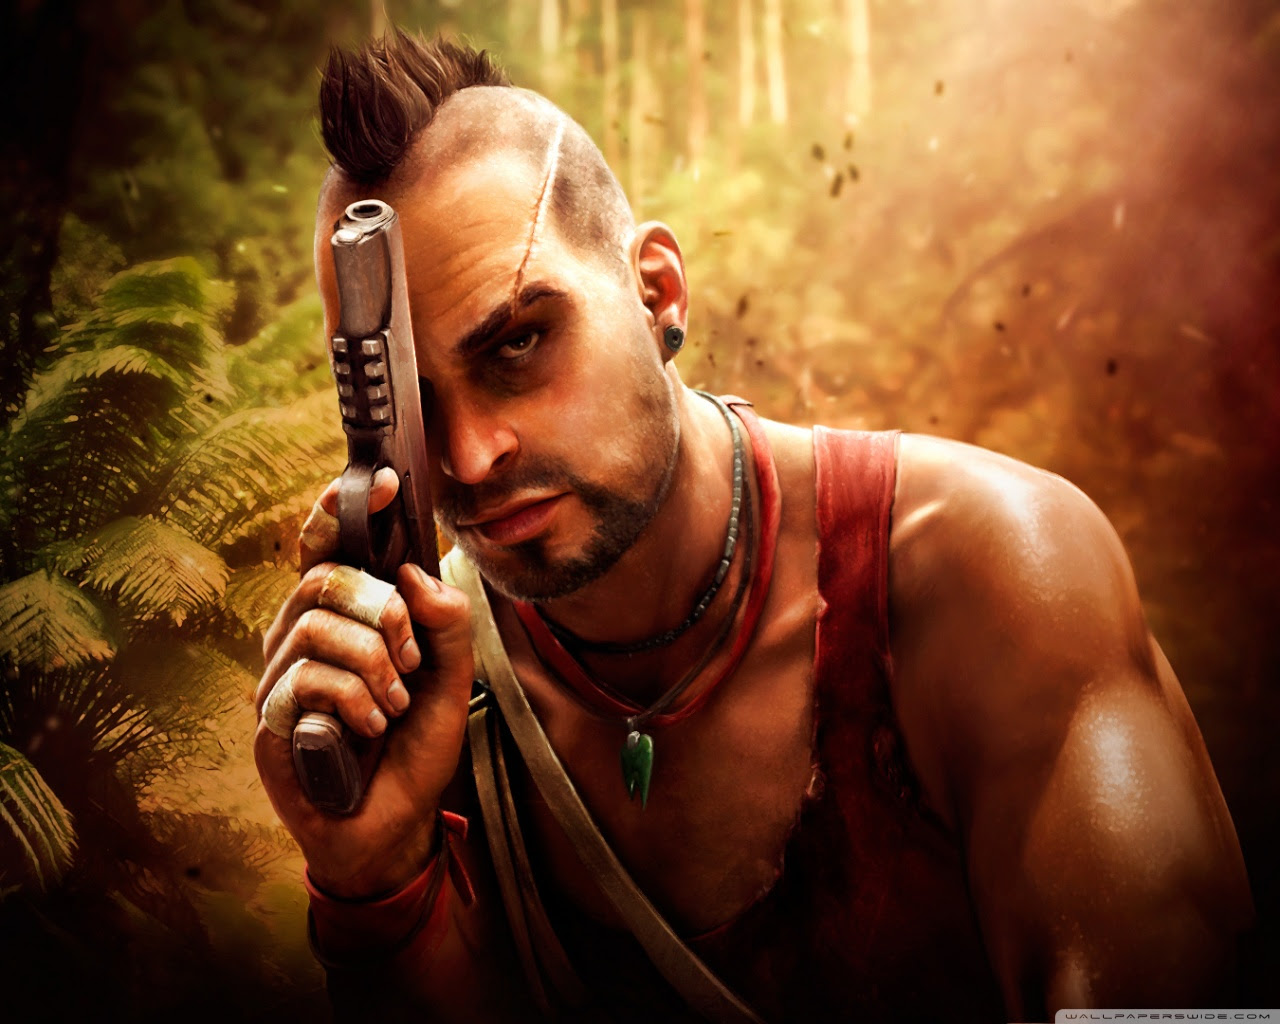 Vaas Far Cry 3 Ultra Hd Desktop Background Wallpaper For 4k Uhd Tv